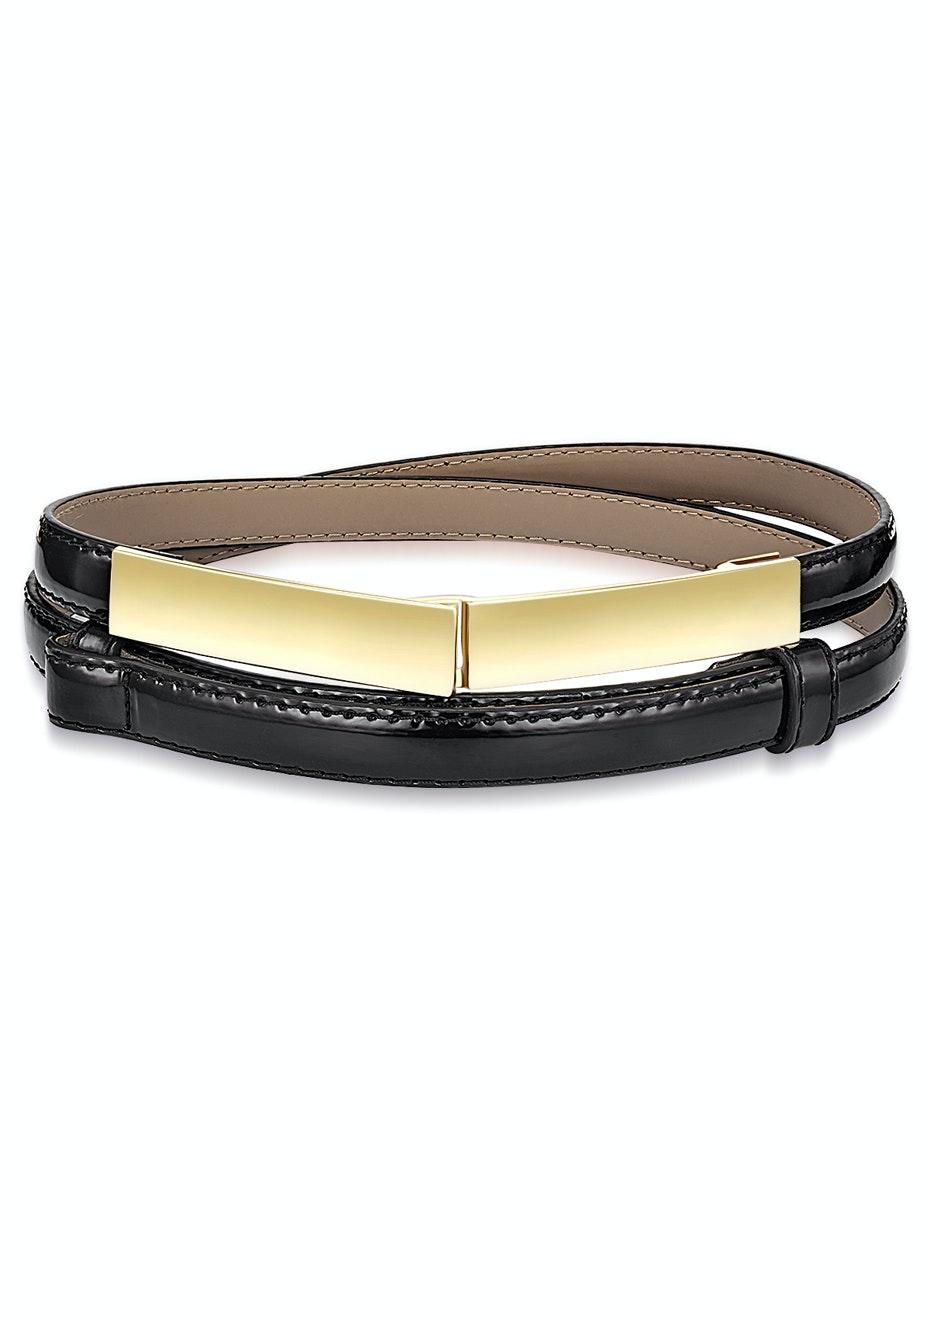 Genuine Cow Leather Skinny Waist Belt-Vogue black